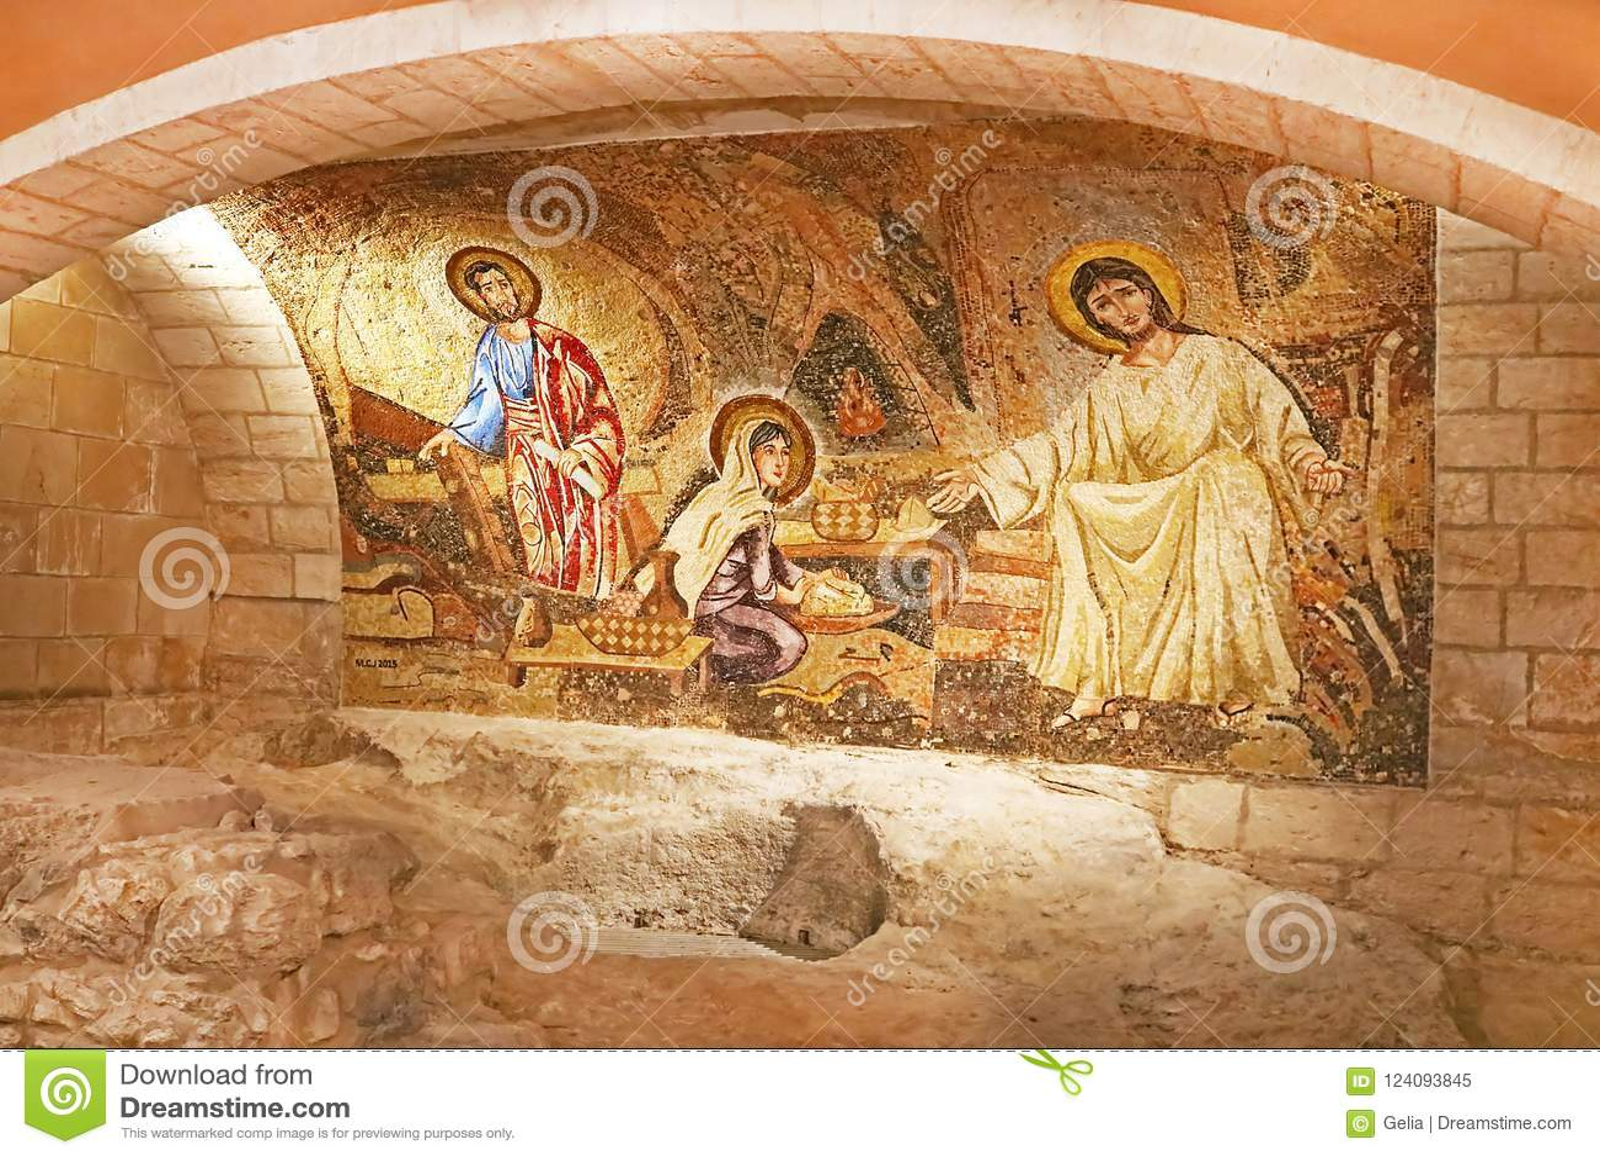 Grotto with Jesus mosaic in Saint Joseph Church, Nazareth